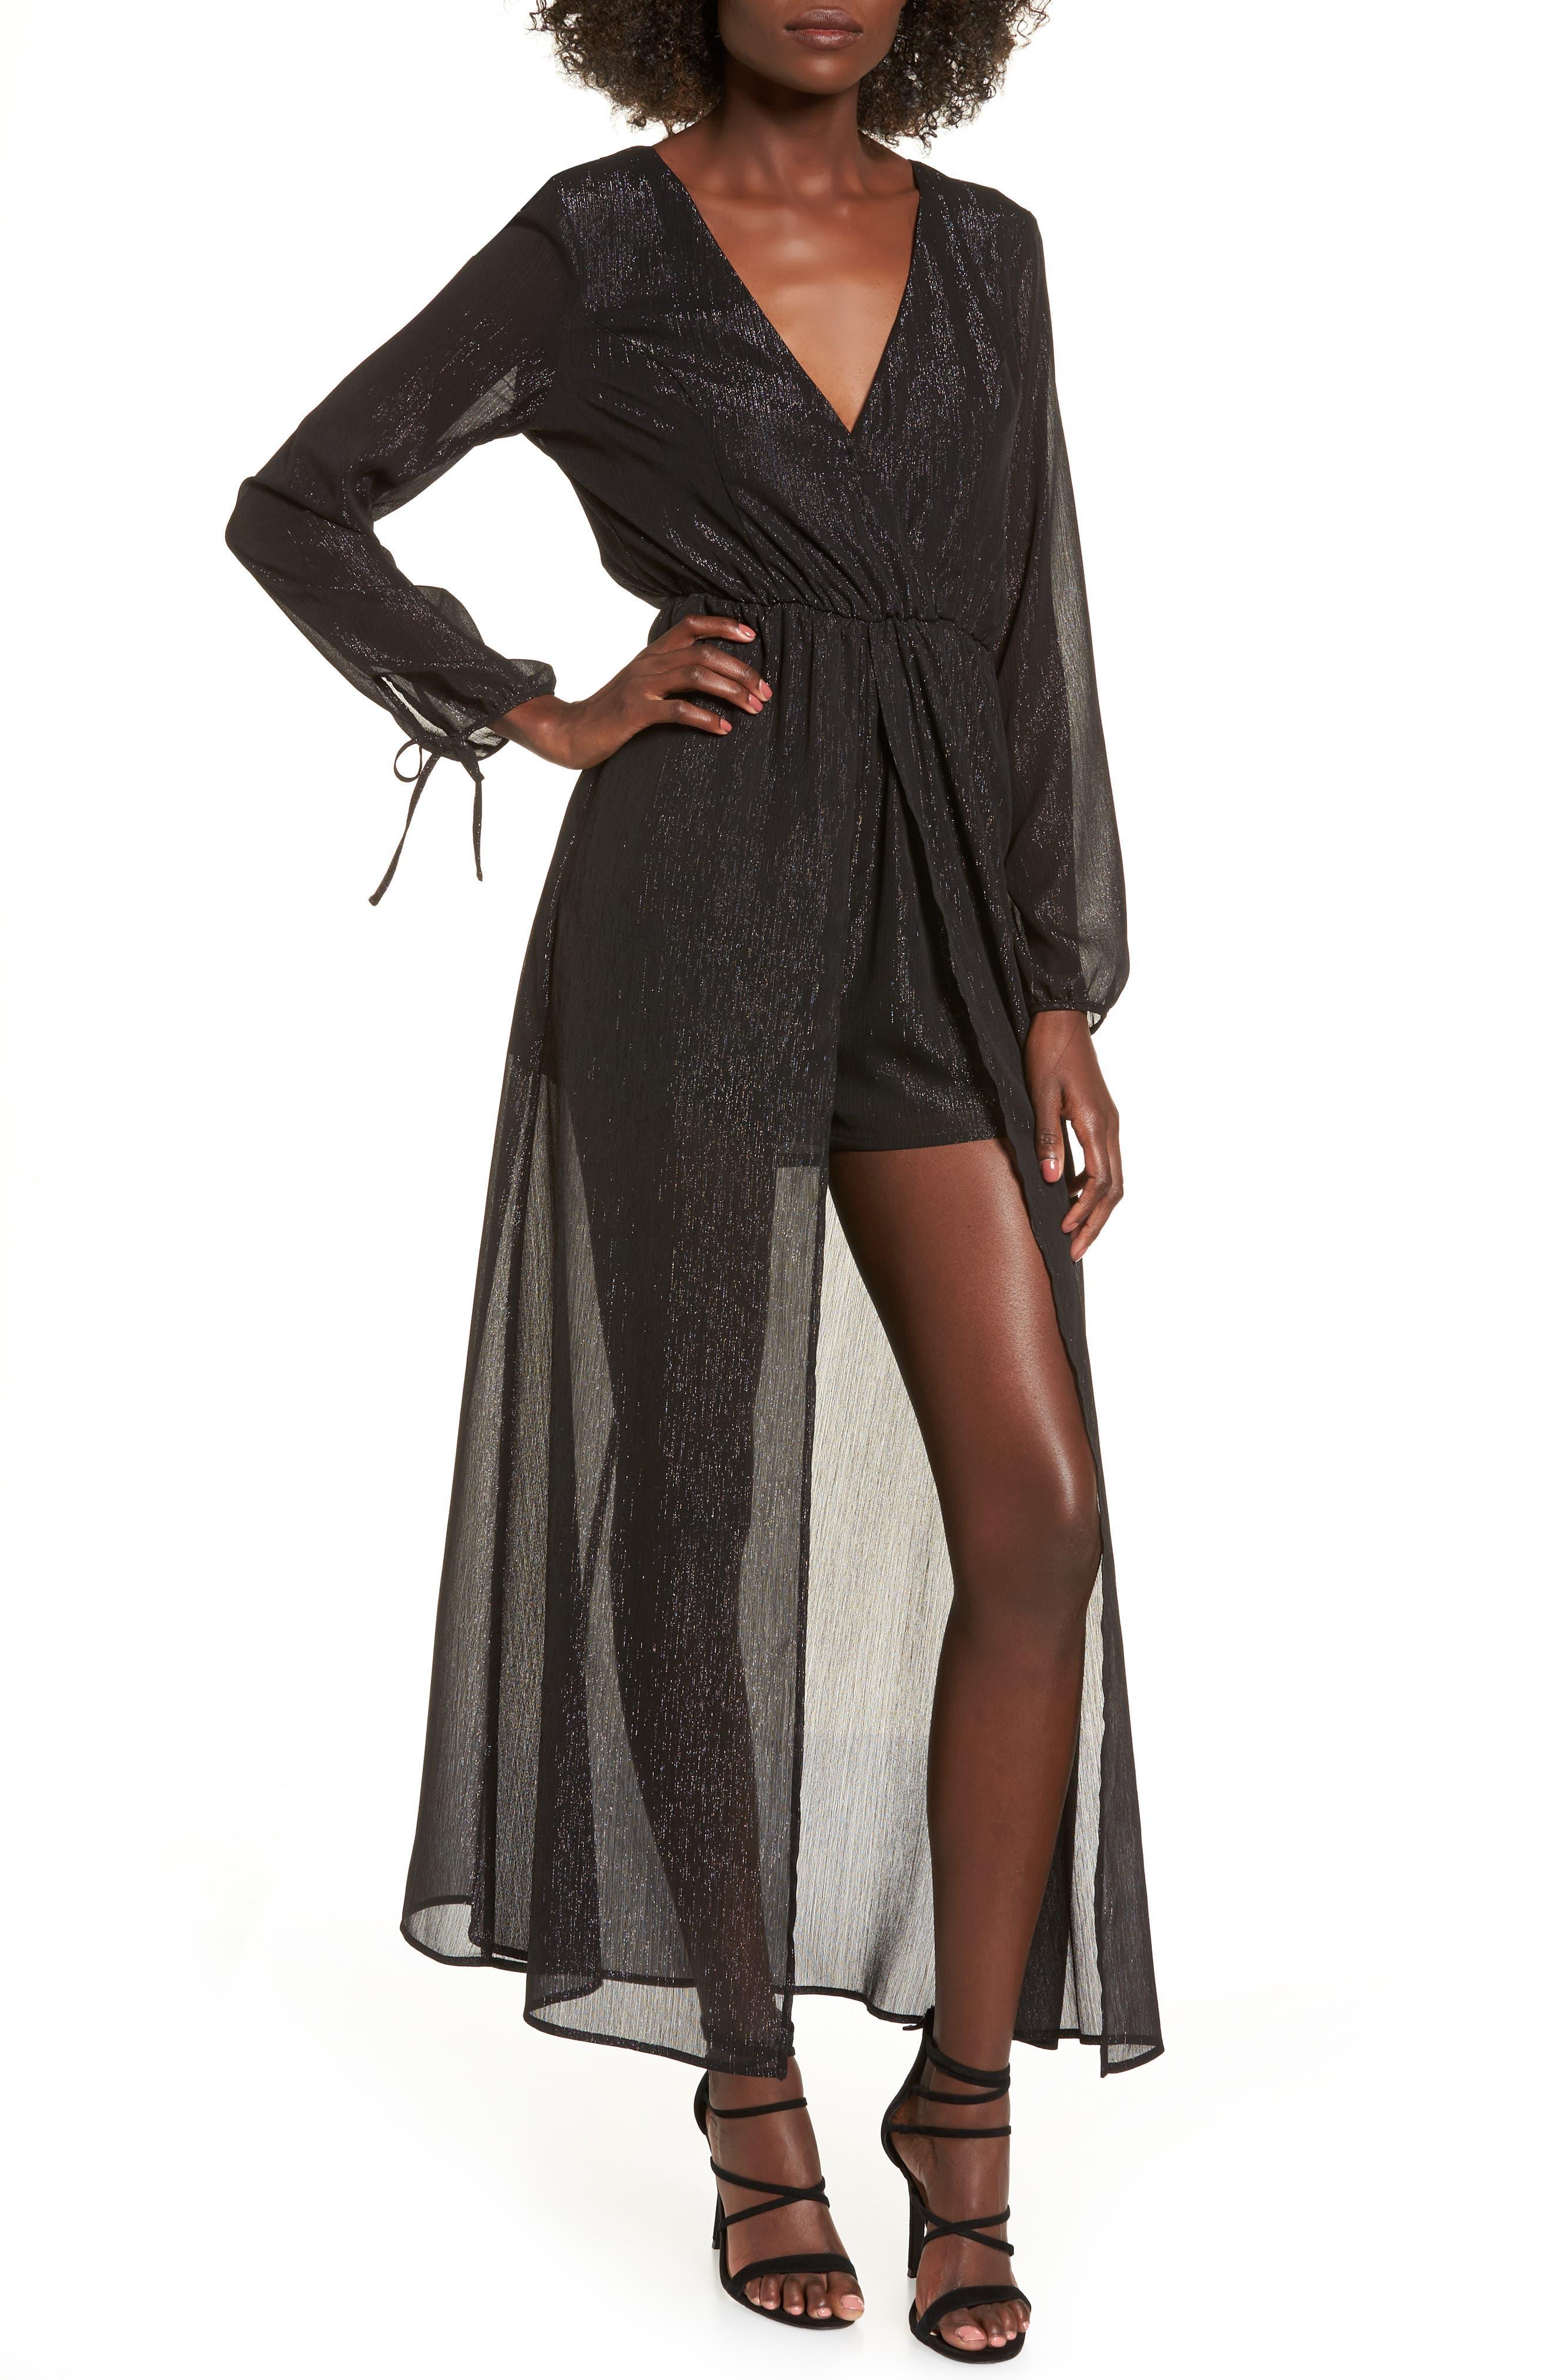 Alternate Image 1 Selected - Speechless Metallic Surplice Dress